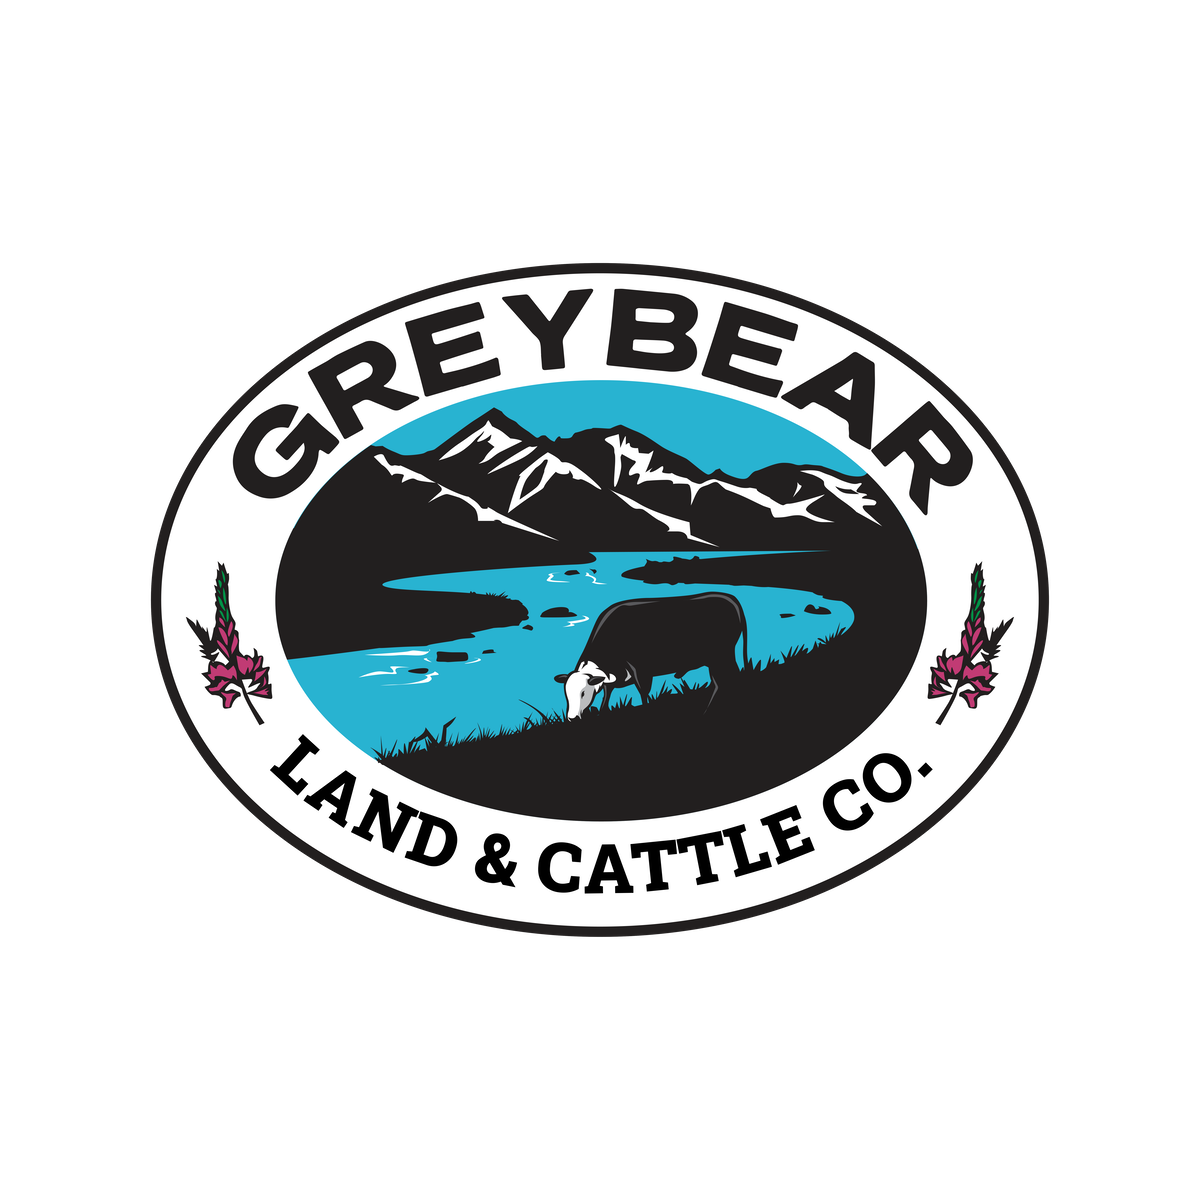 Yellowstone Property (GreyBear Ranch on The Yellowstone)